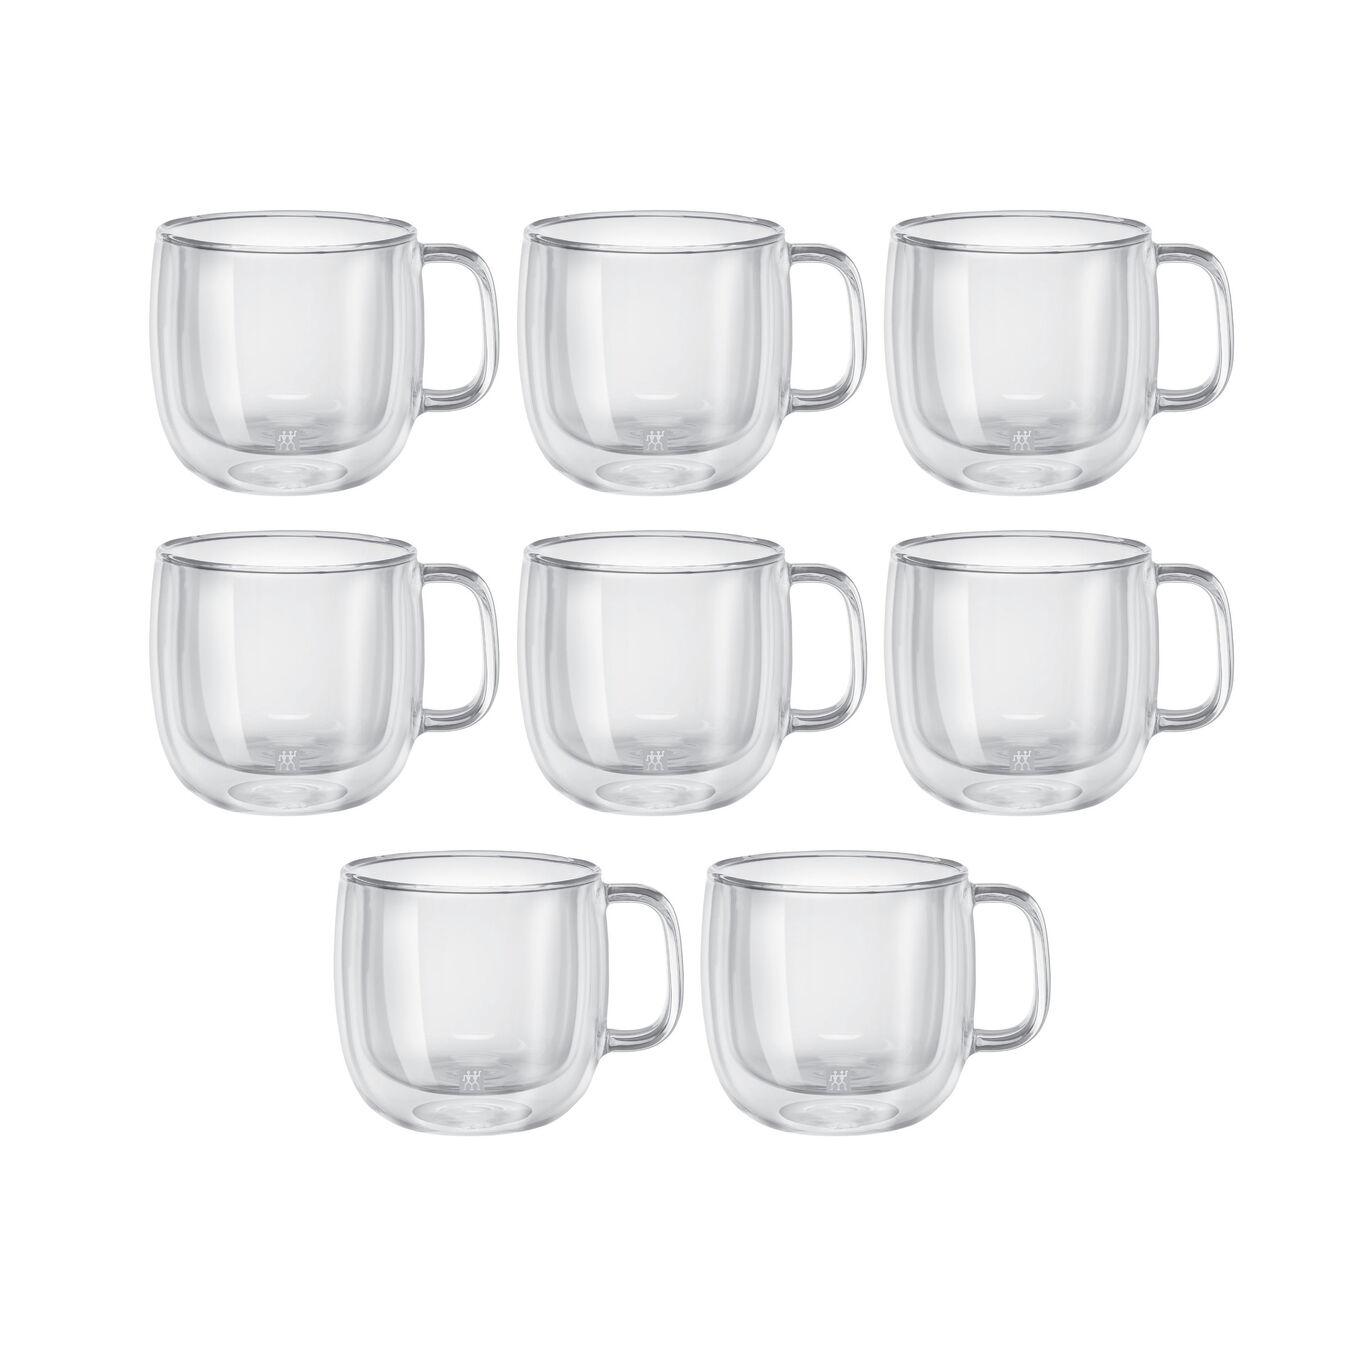 8 Piece Cappuccino set - Buy 6 Get 8,,large 1